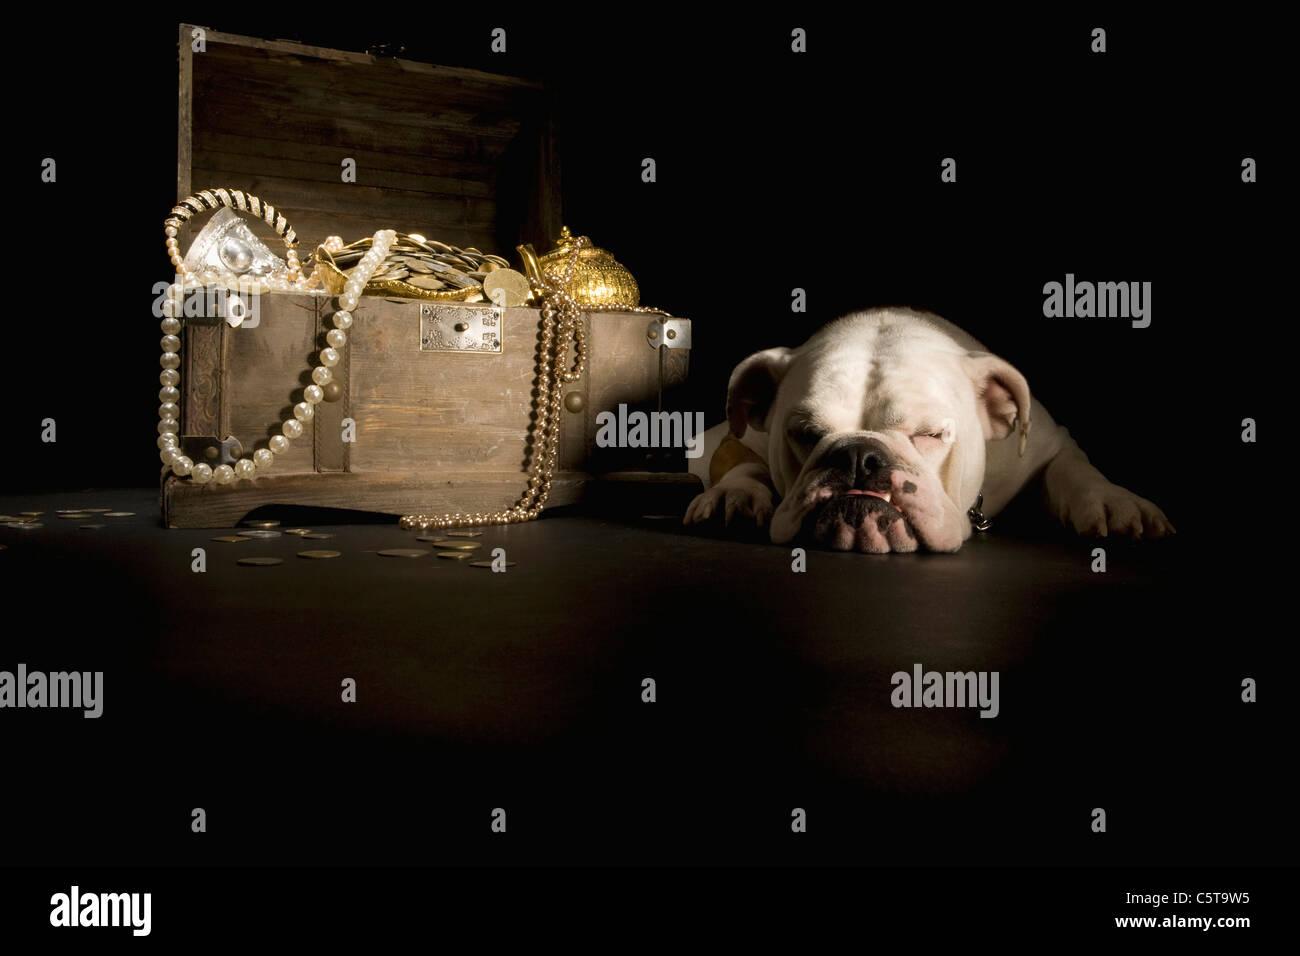 Bulldog sleeping next treasure chest - Stock Image